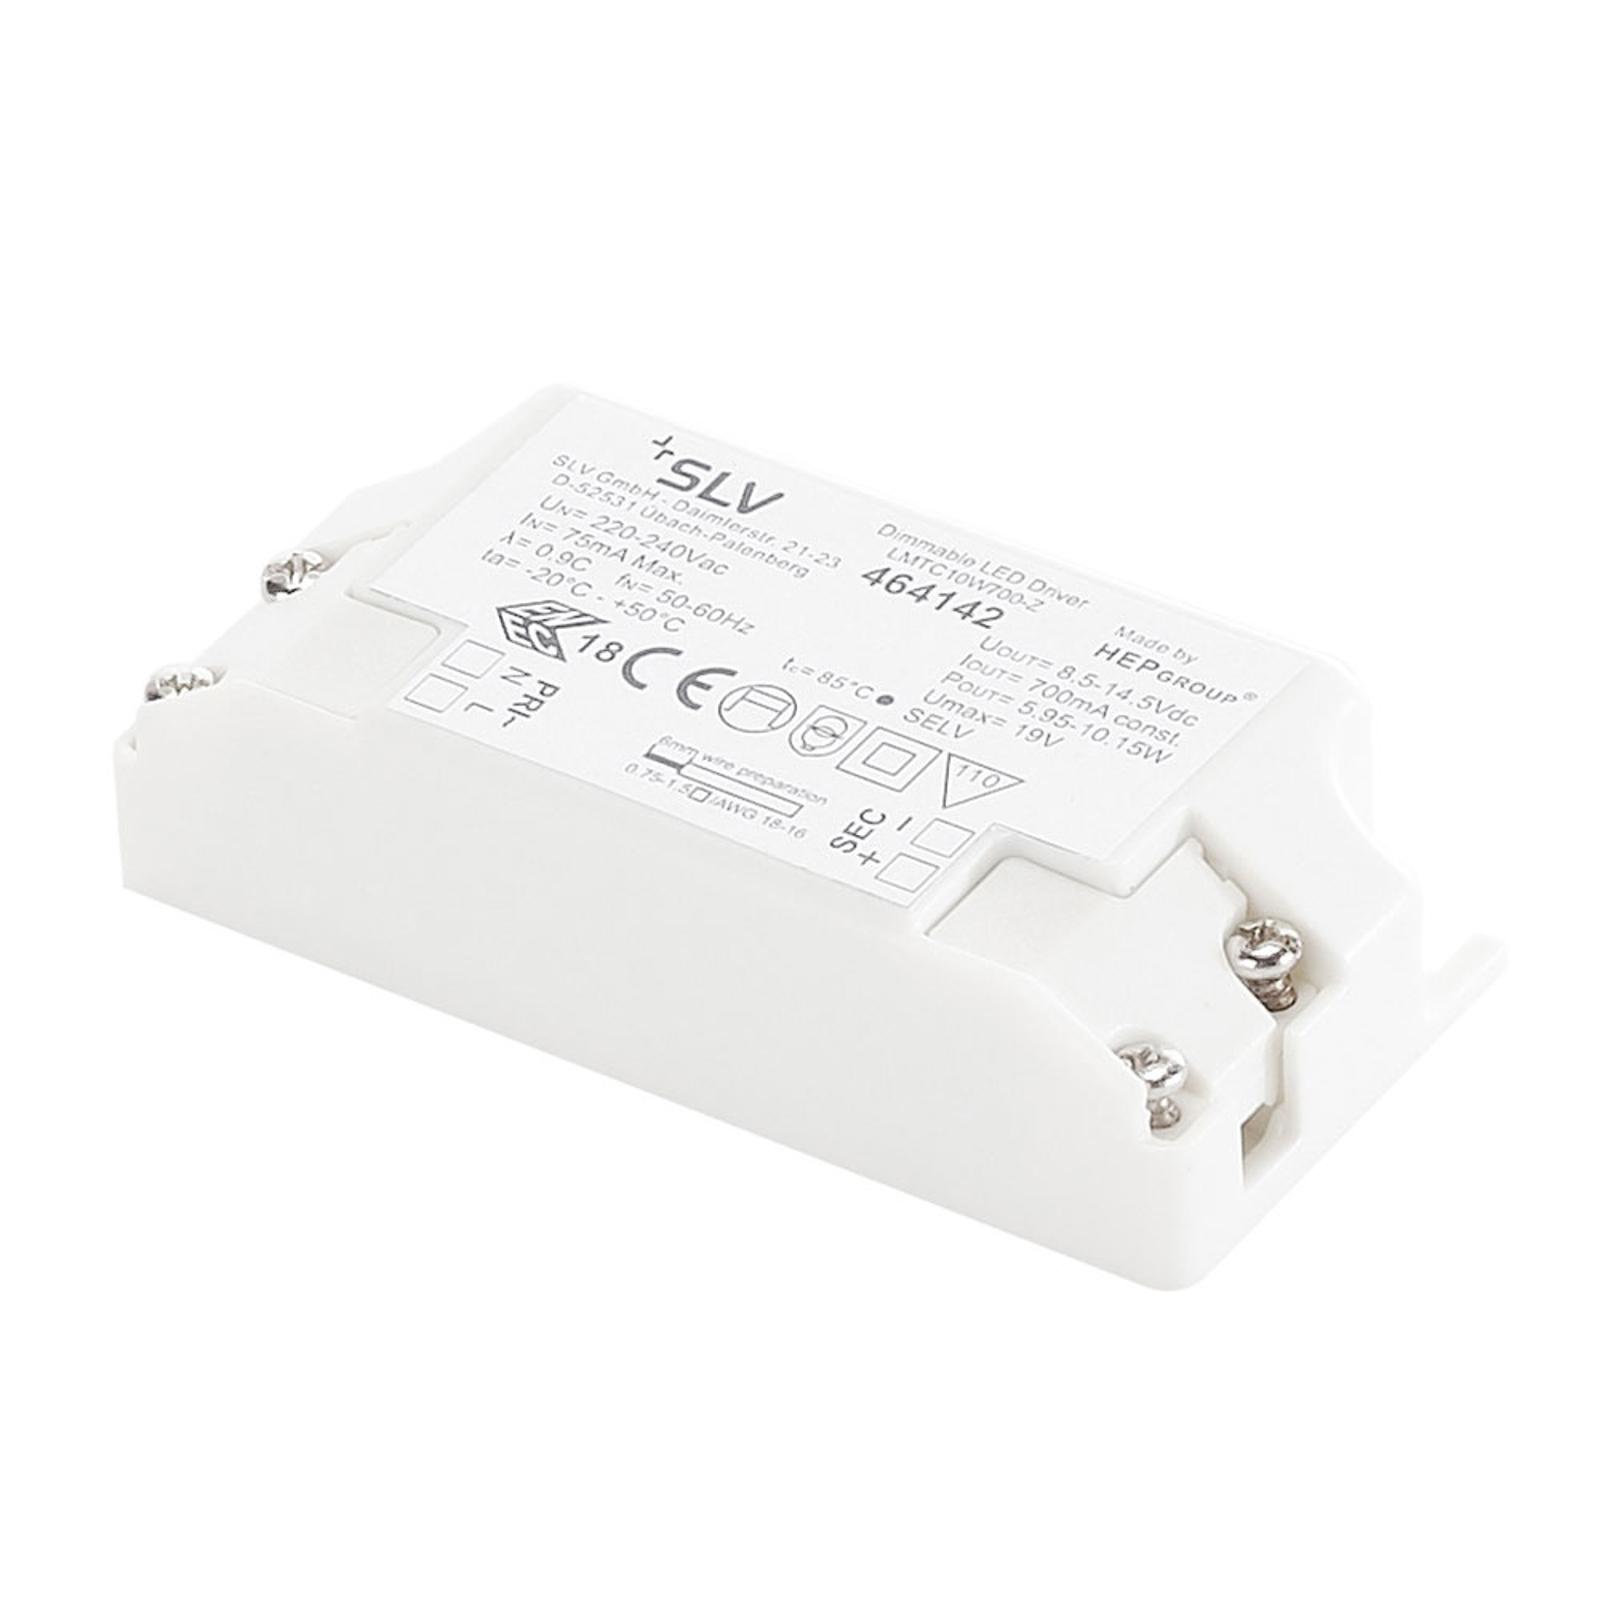 SLV LED-driver 10,5 W, 700 mA, dimbar